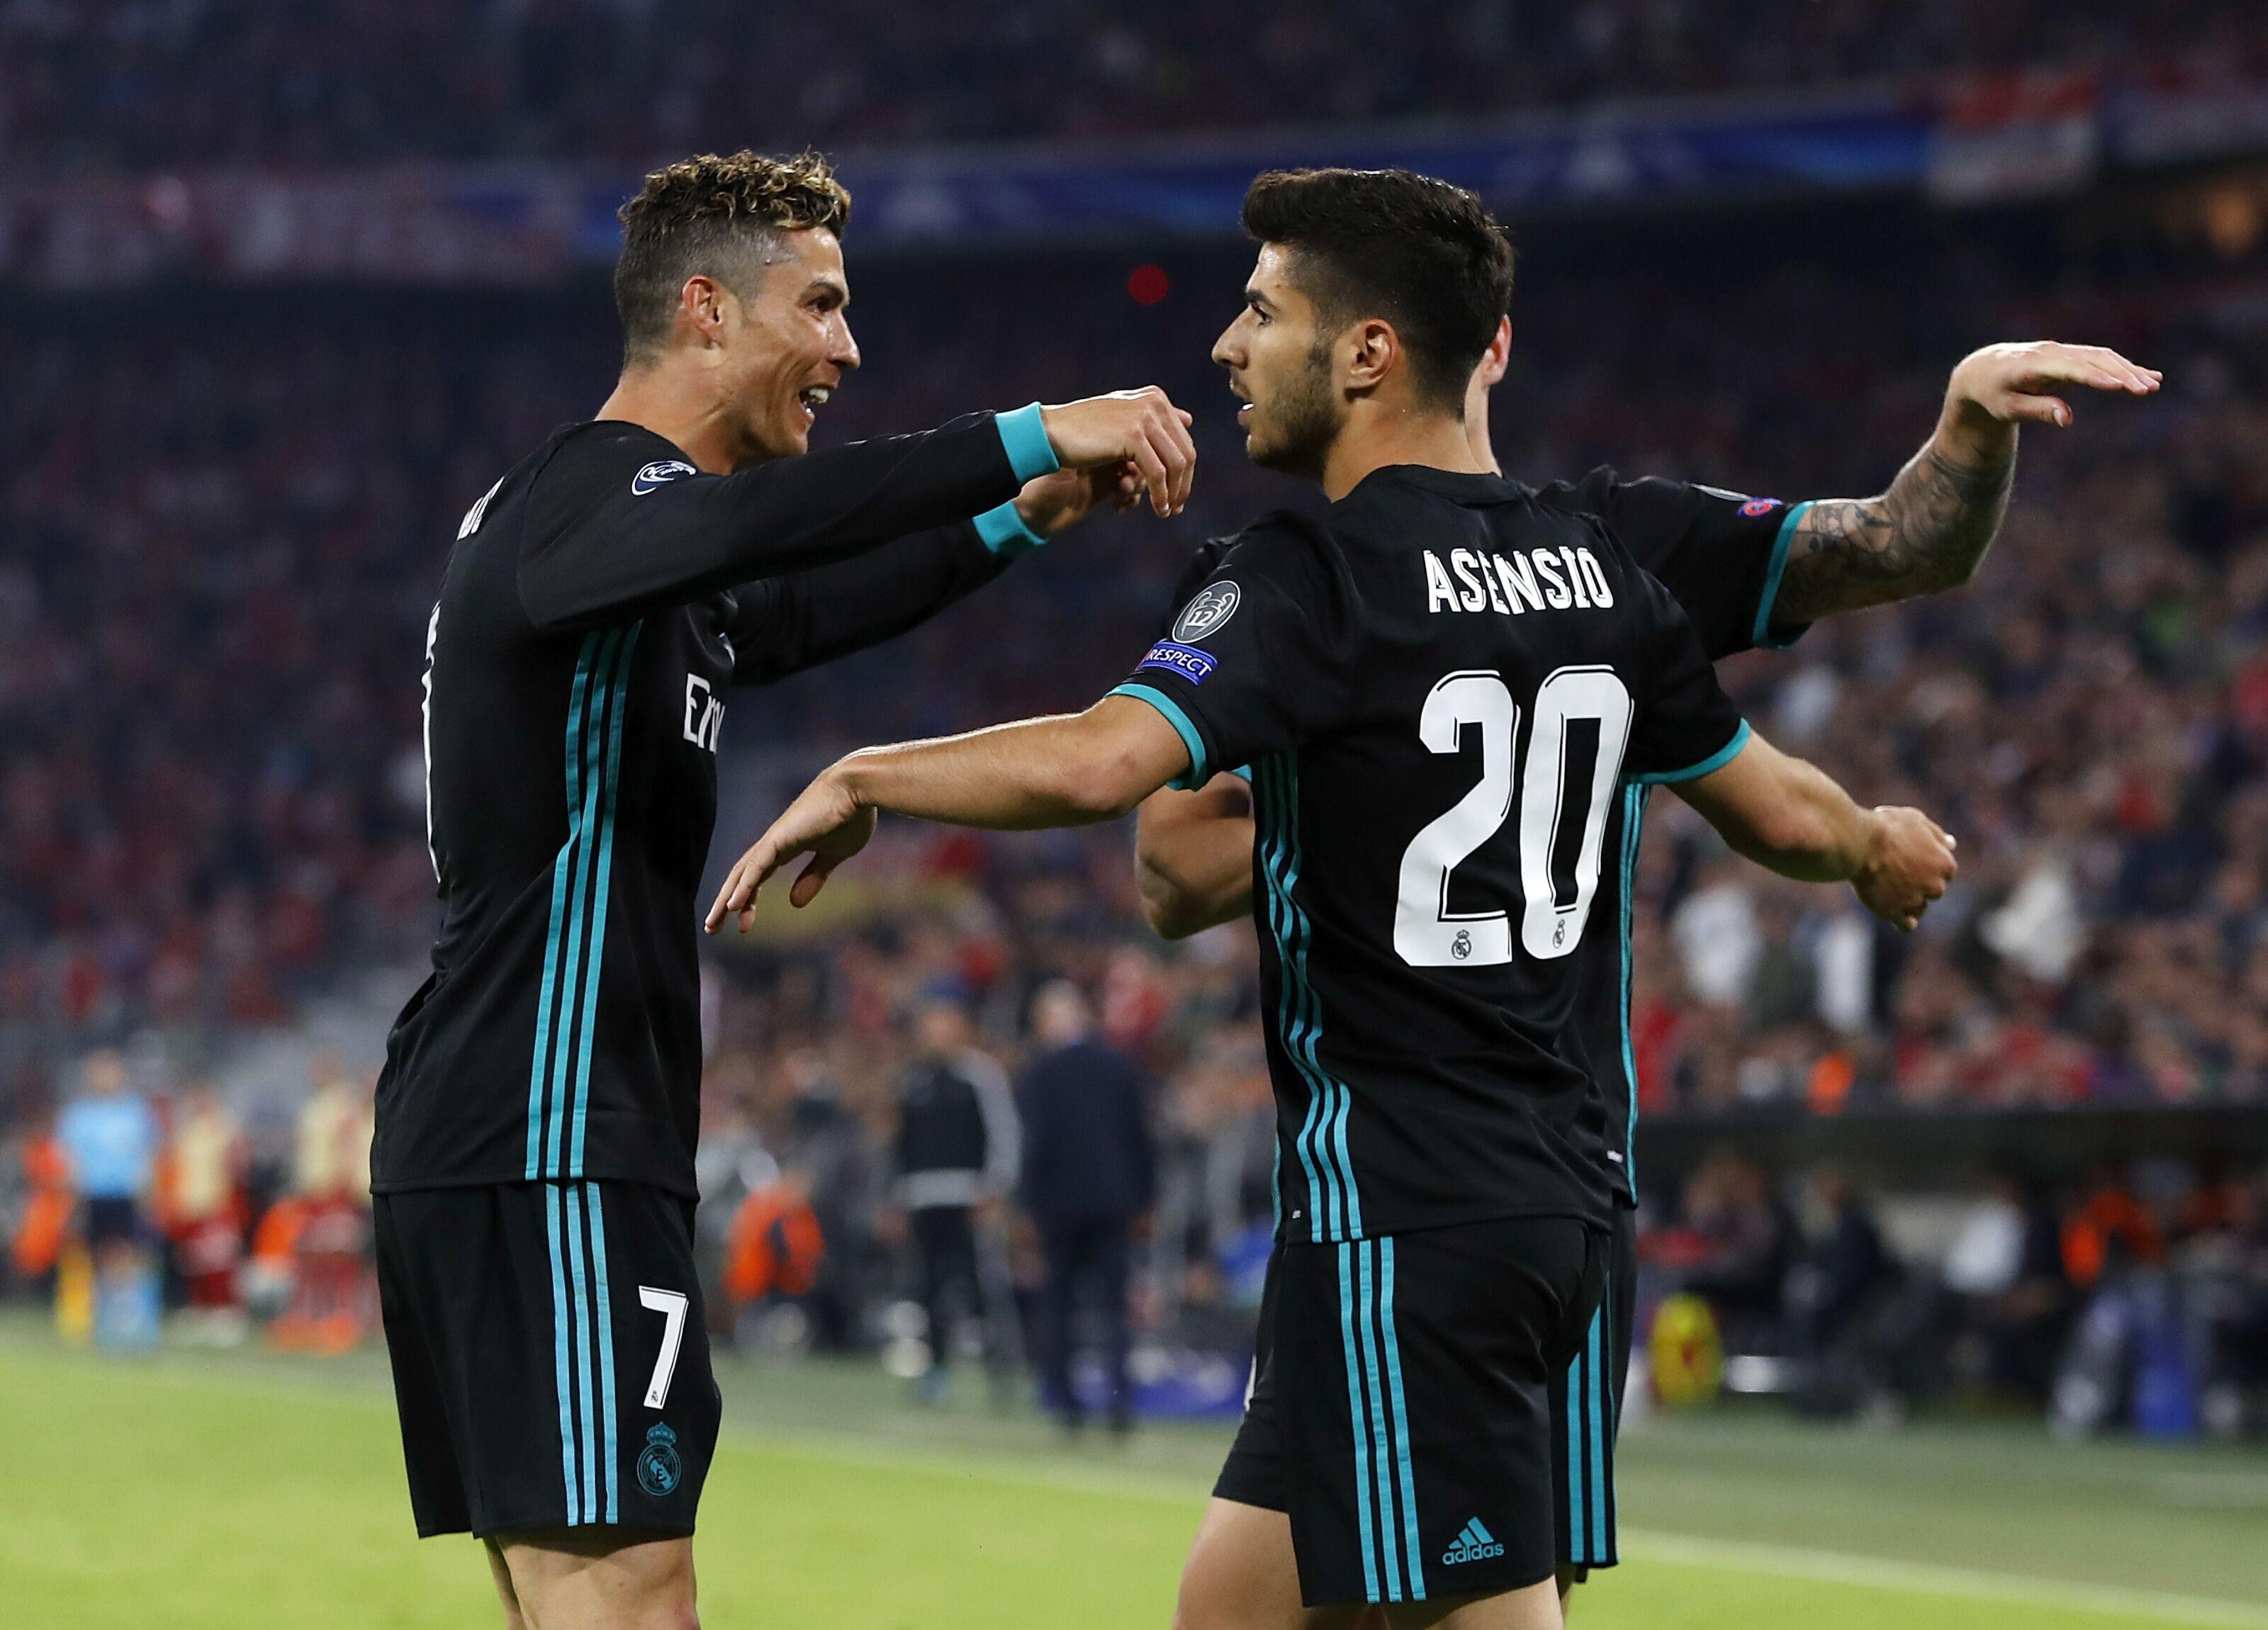 Real Madrid 1 2: Bayern Munich 1-2 Real Madrid: Champions League Highlights